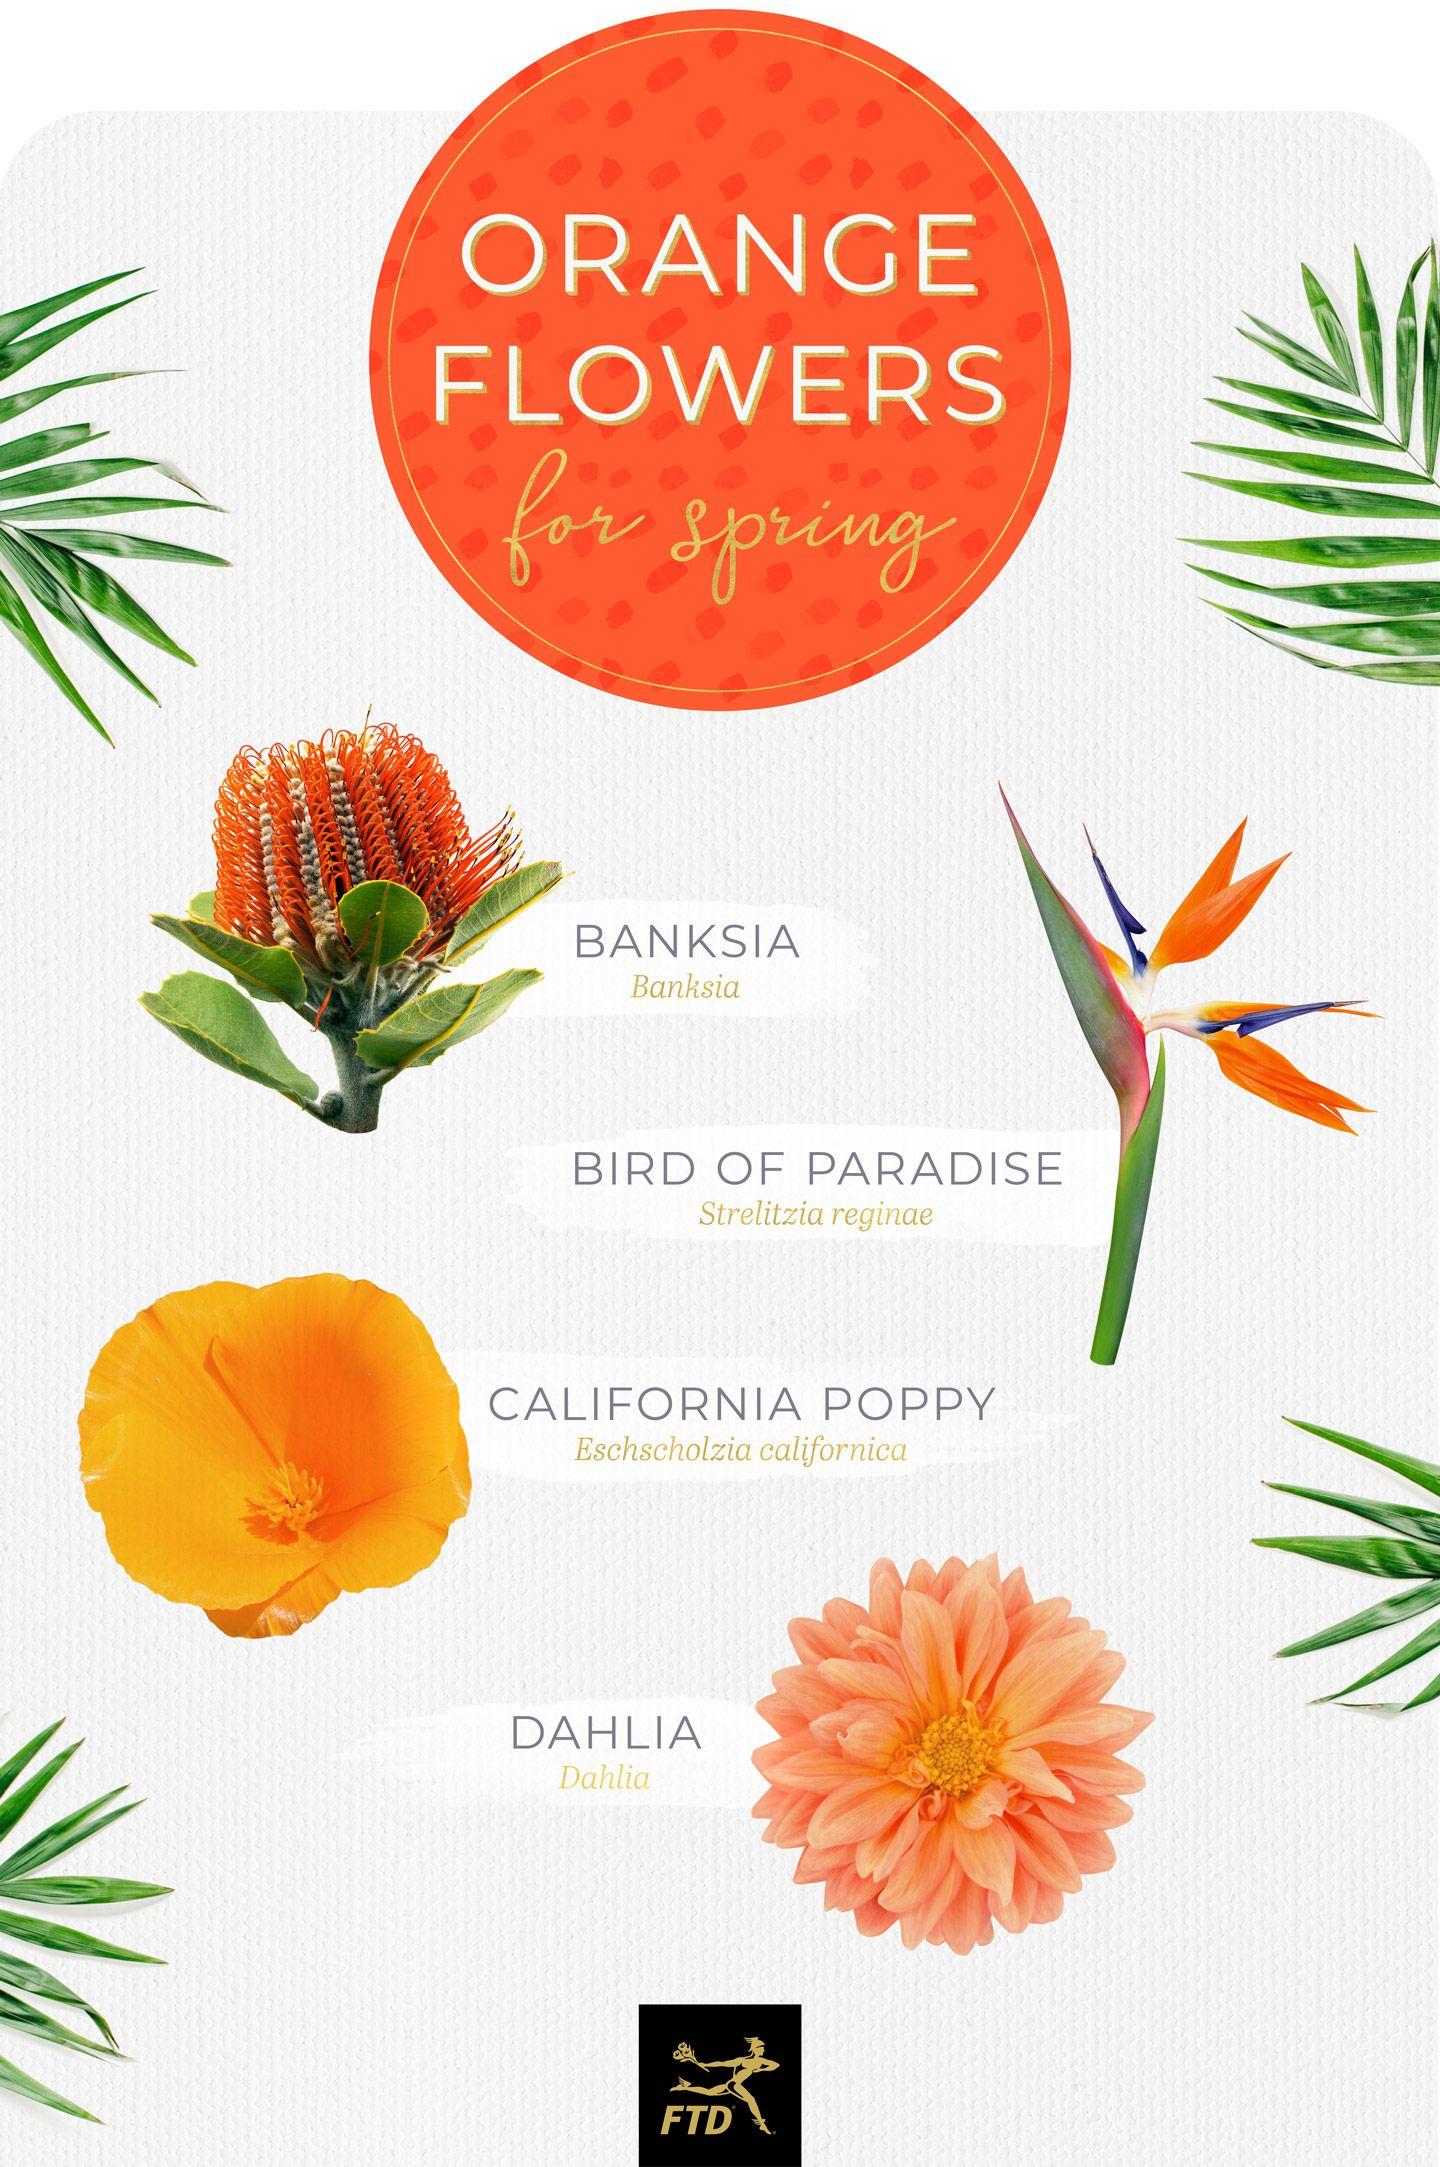 20 Types Of Orange Flowers Ftd Com Types Of Oranges Orange Flowers Types Of Flowers